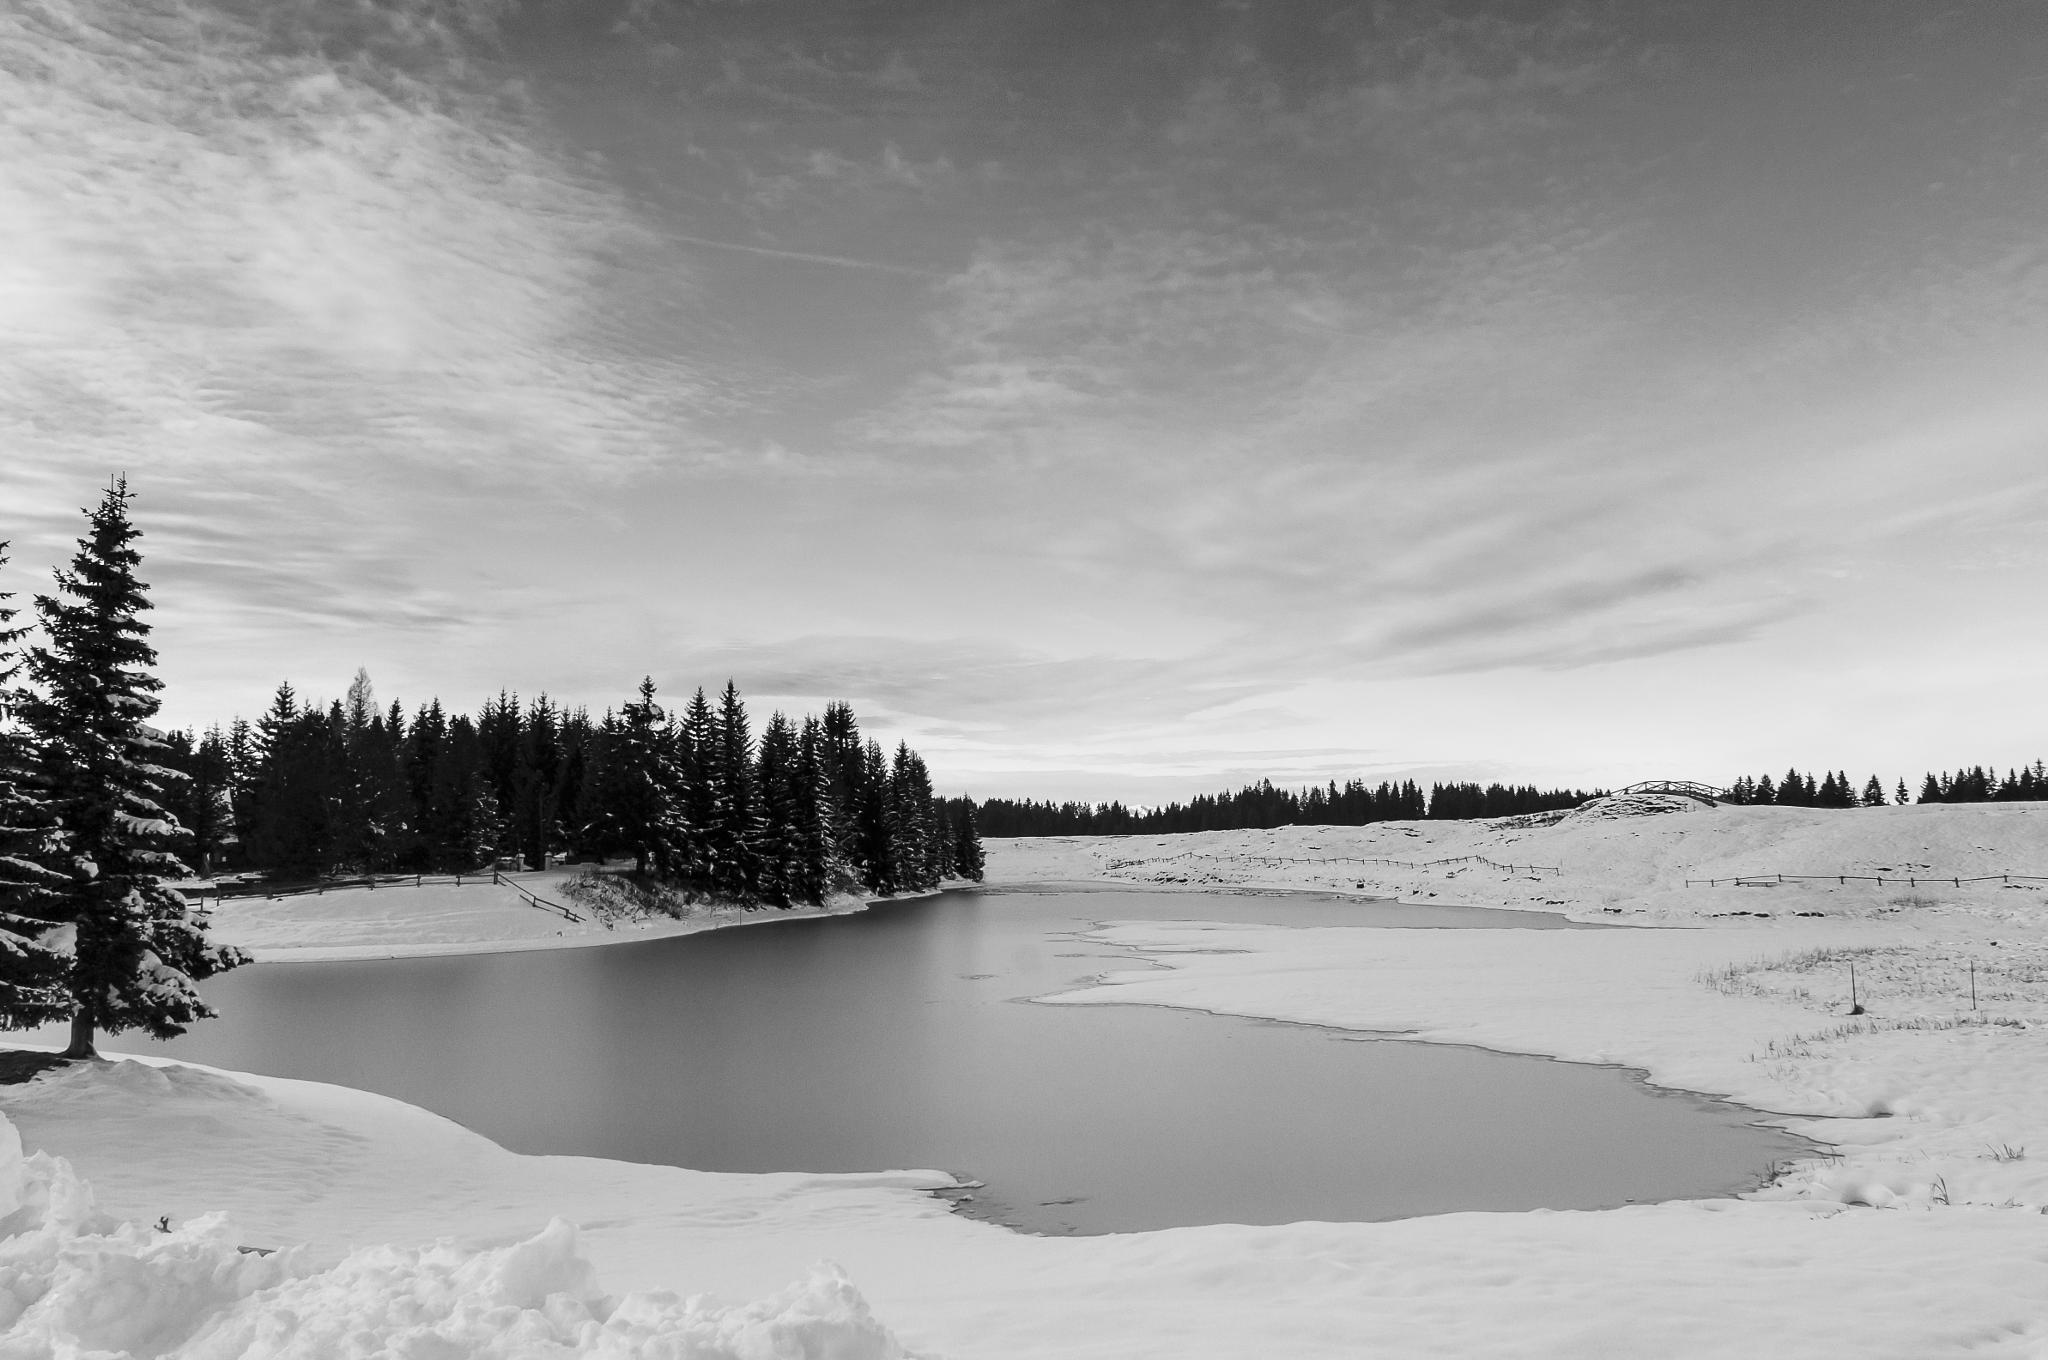 Winter lake by Fabio Drigo